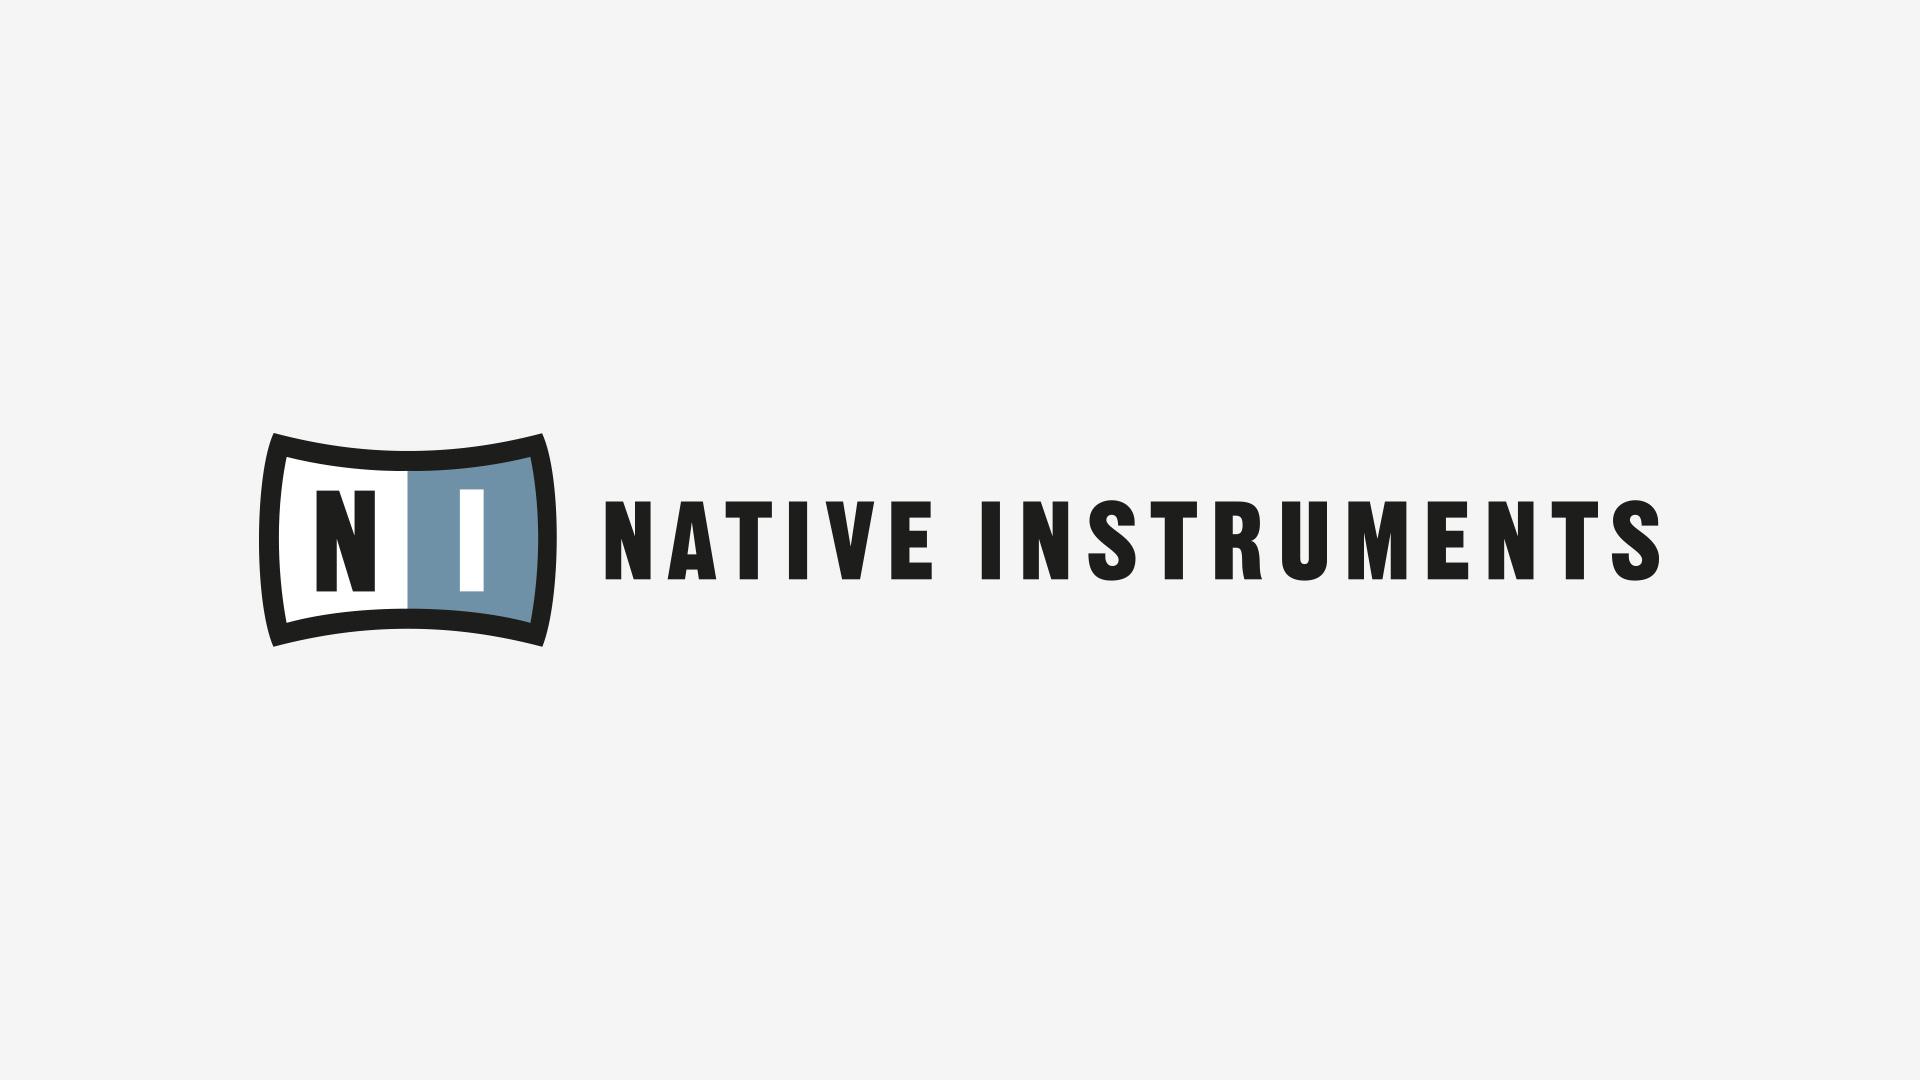 Native Instruments GmbH